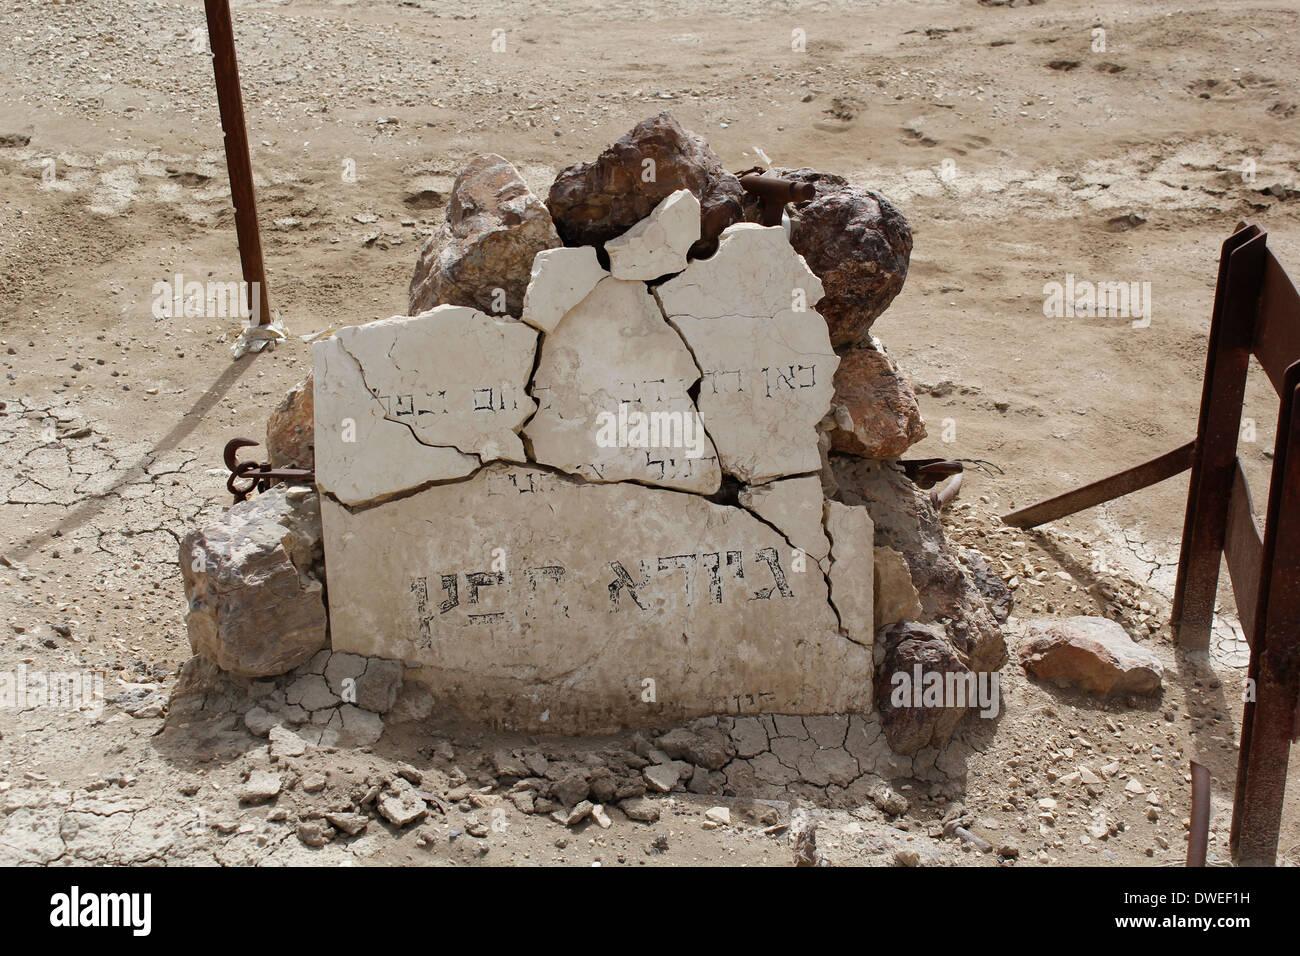 Remnant of an Israeli military memorial site in the Jordan valley Israel Stock Photo